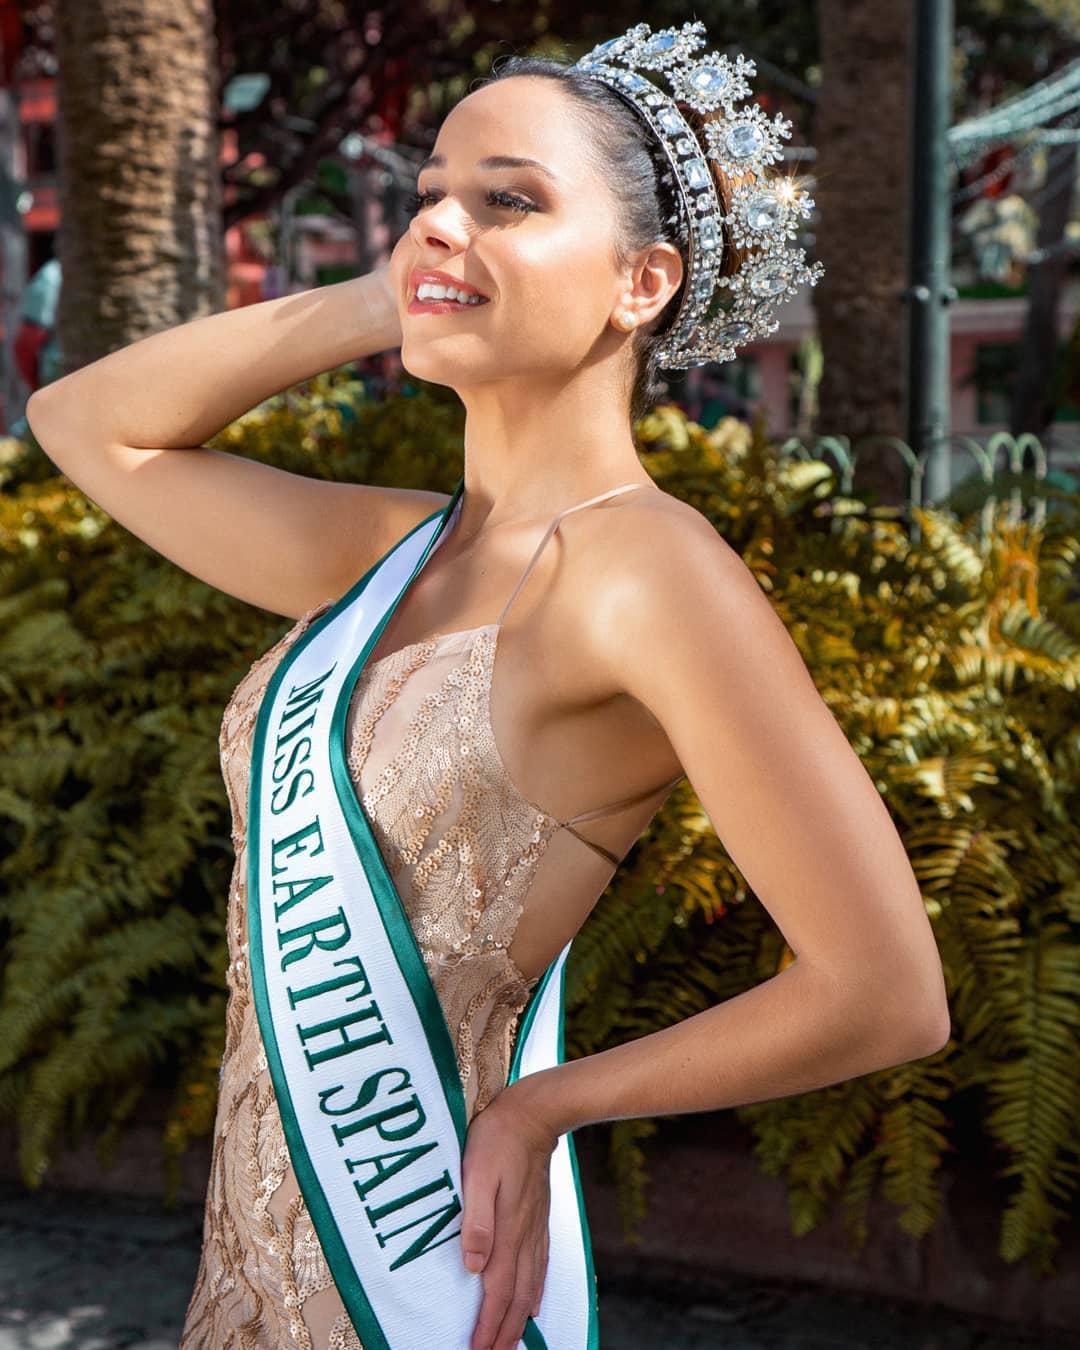 marta lorenzo, miss earth spain 2020/1st runner-up de world beauty queen 2018/miss eco espana 2017. - Página 5 Martal22